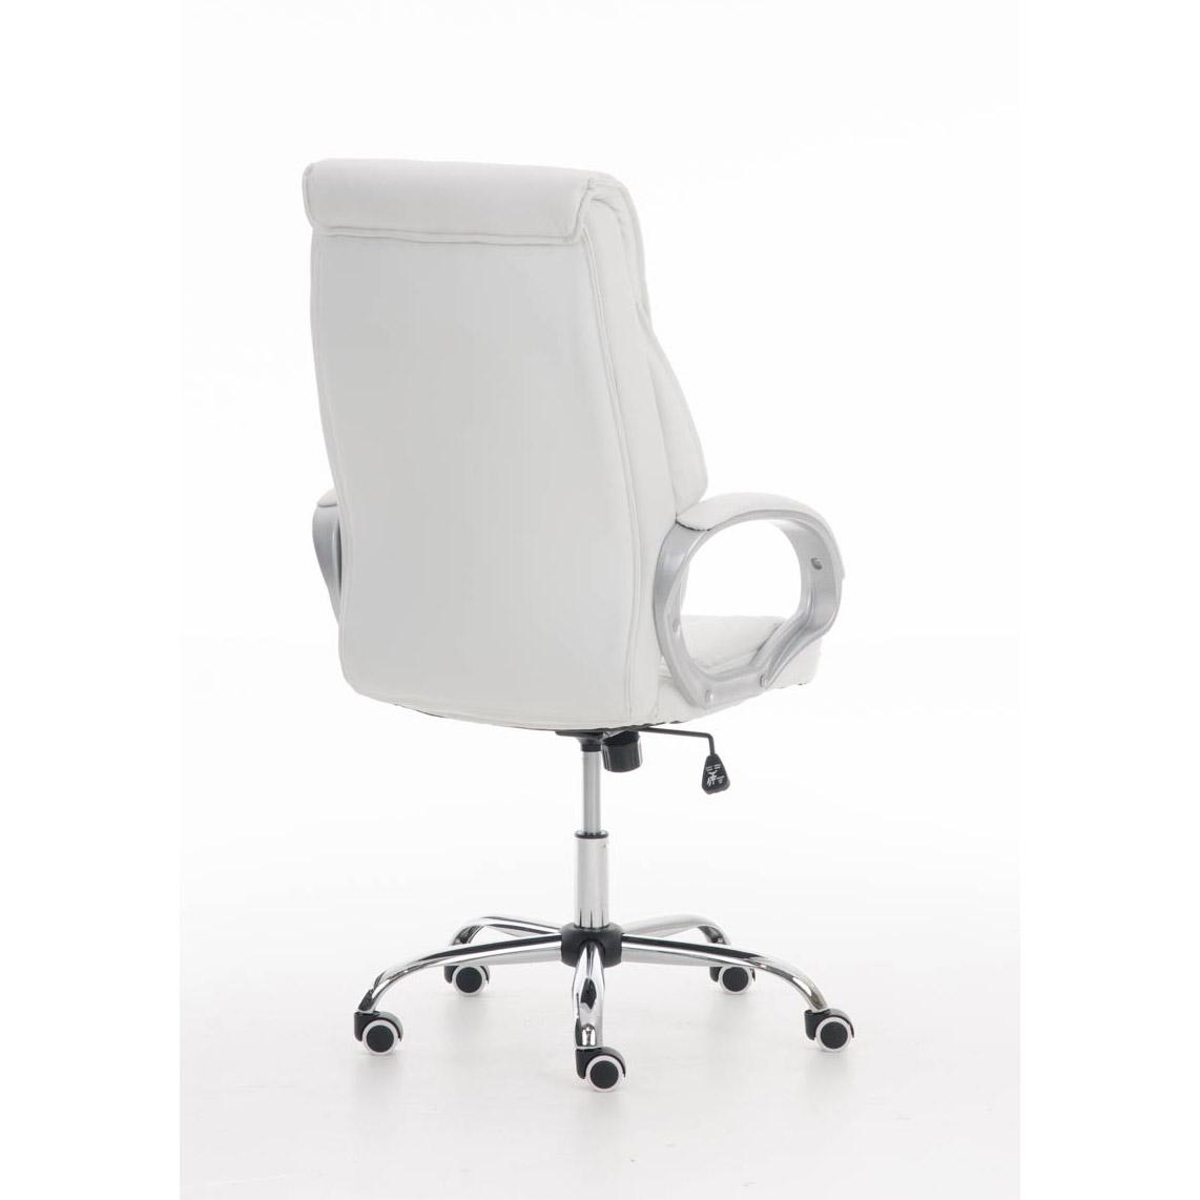 Sill N De Oficina Kimi Gran Respaldo Acolchado En Blanco